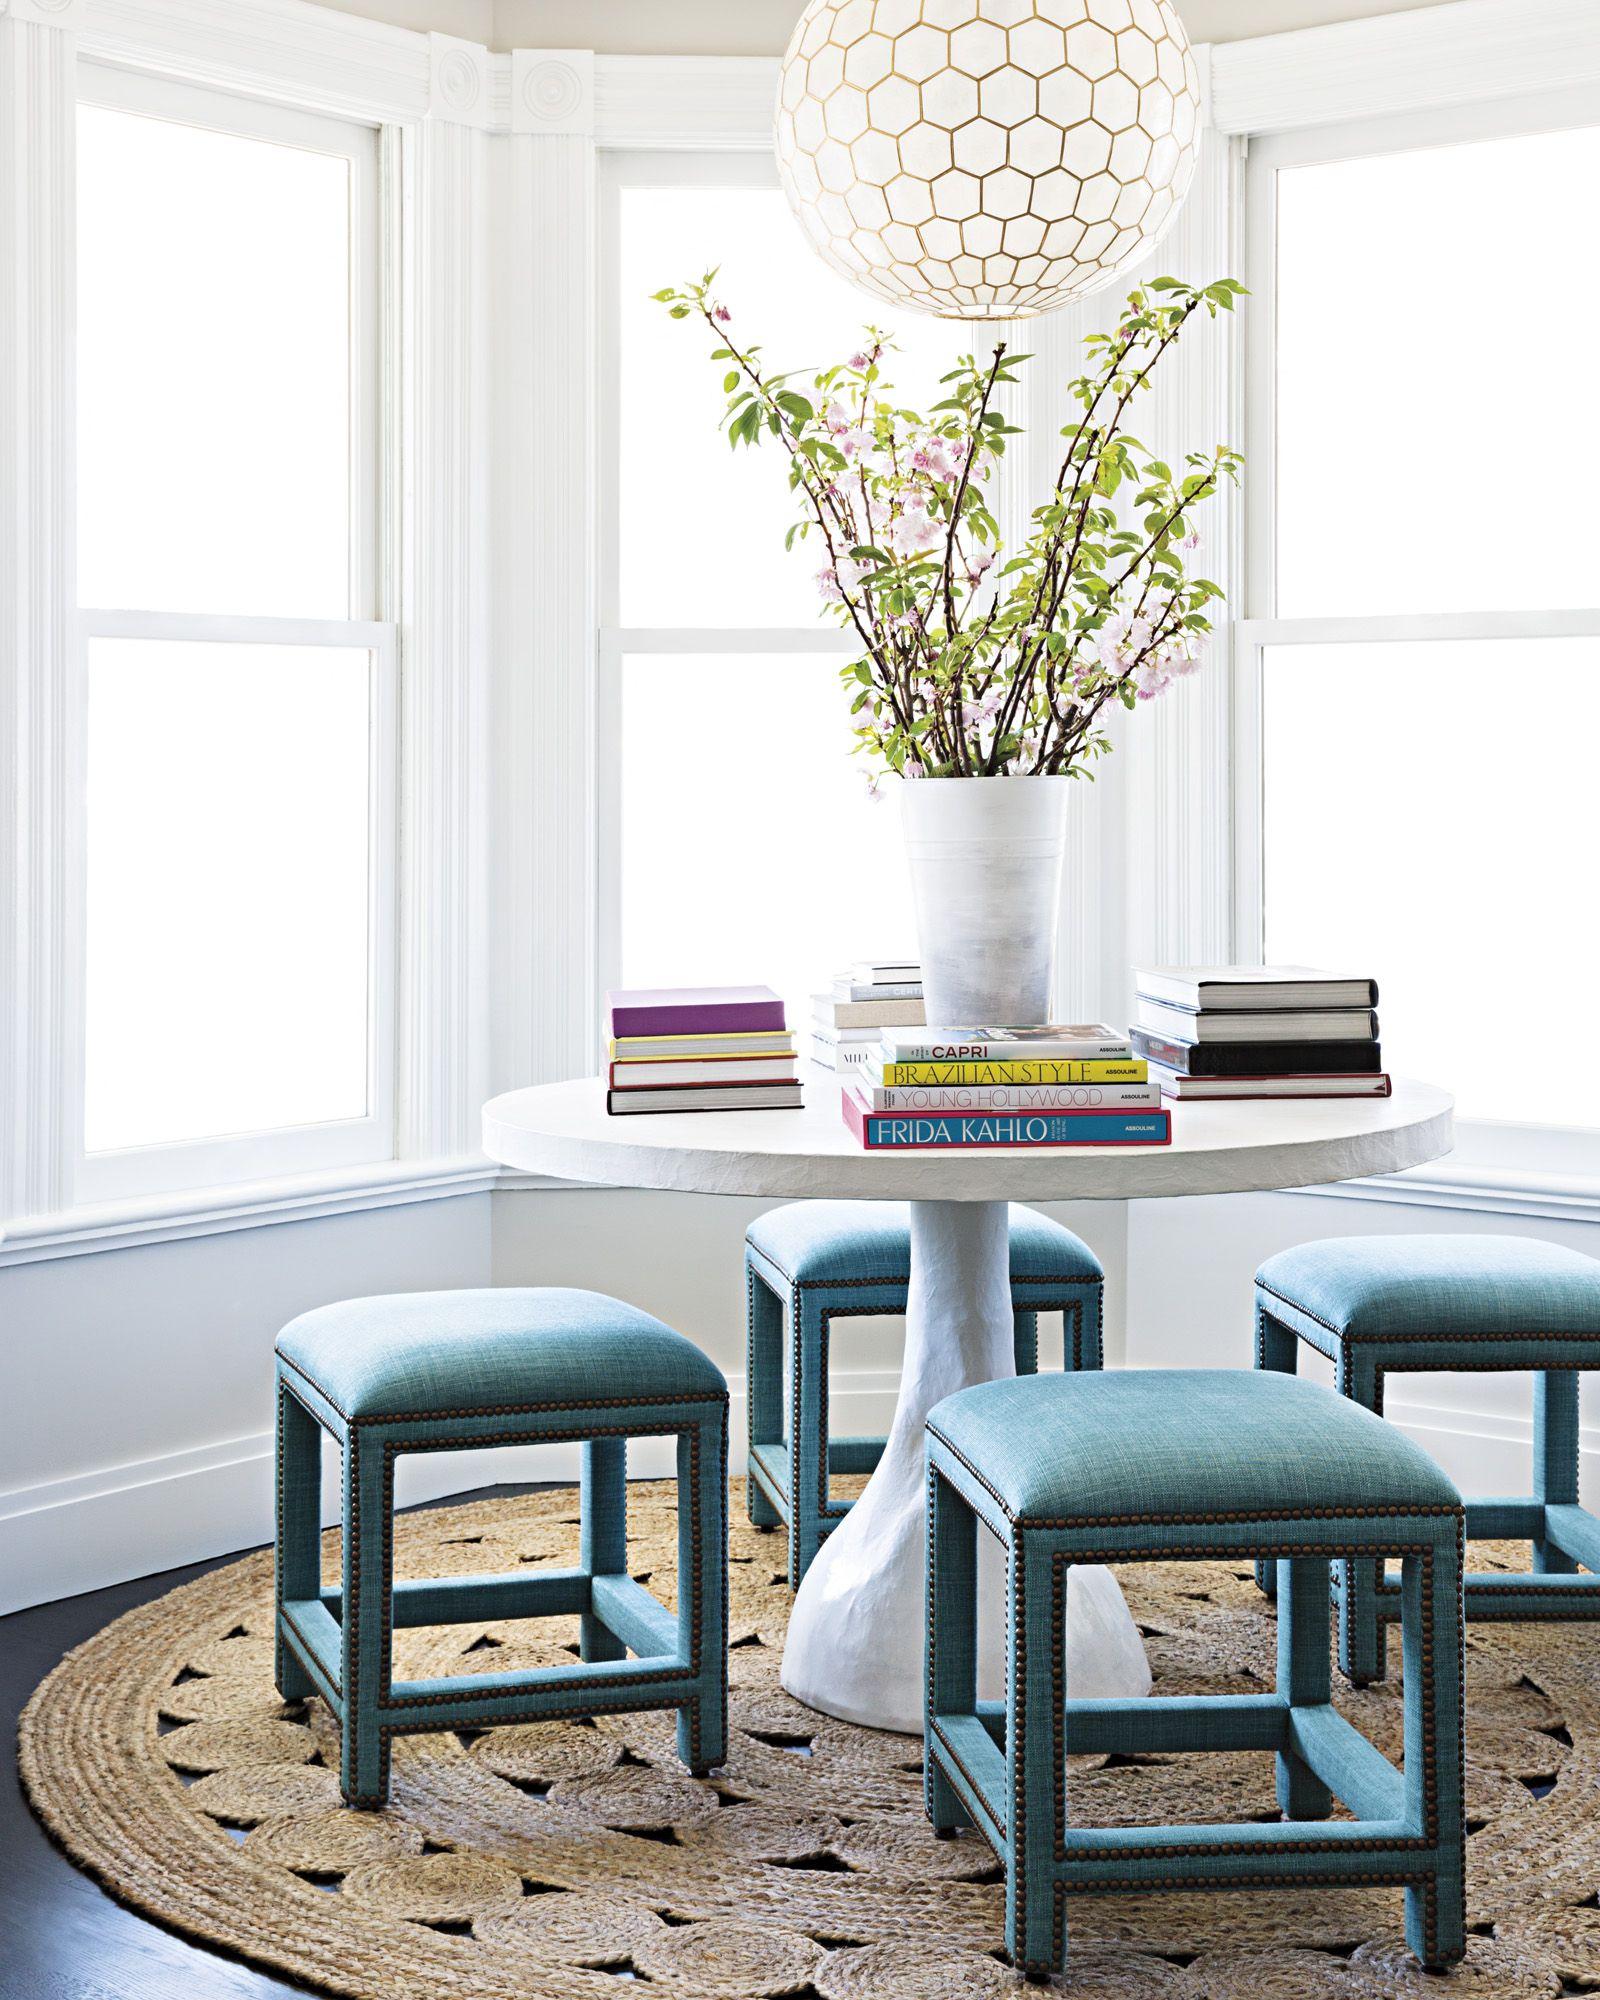 Unique Living Room Furniture Sets: Unique Dining Set With Statement Stools! #DiningRoom